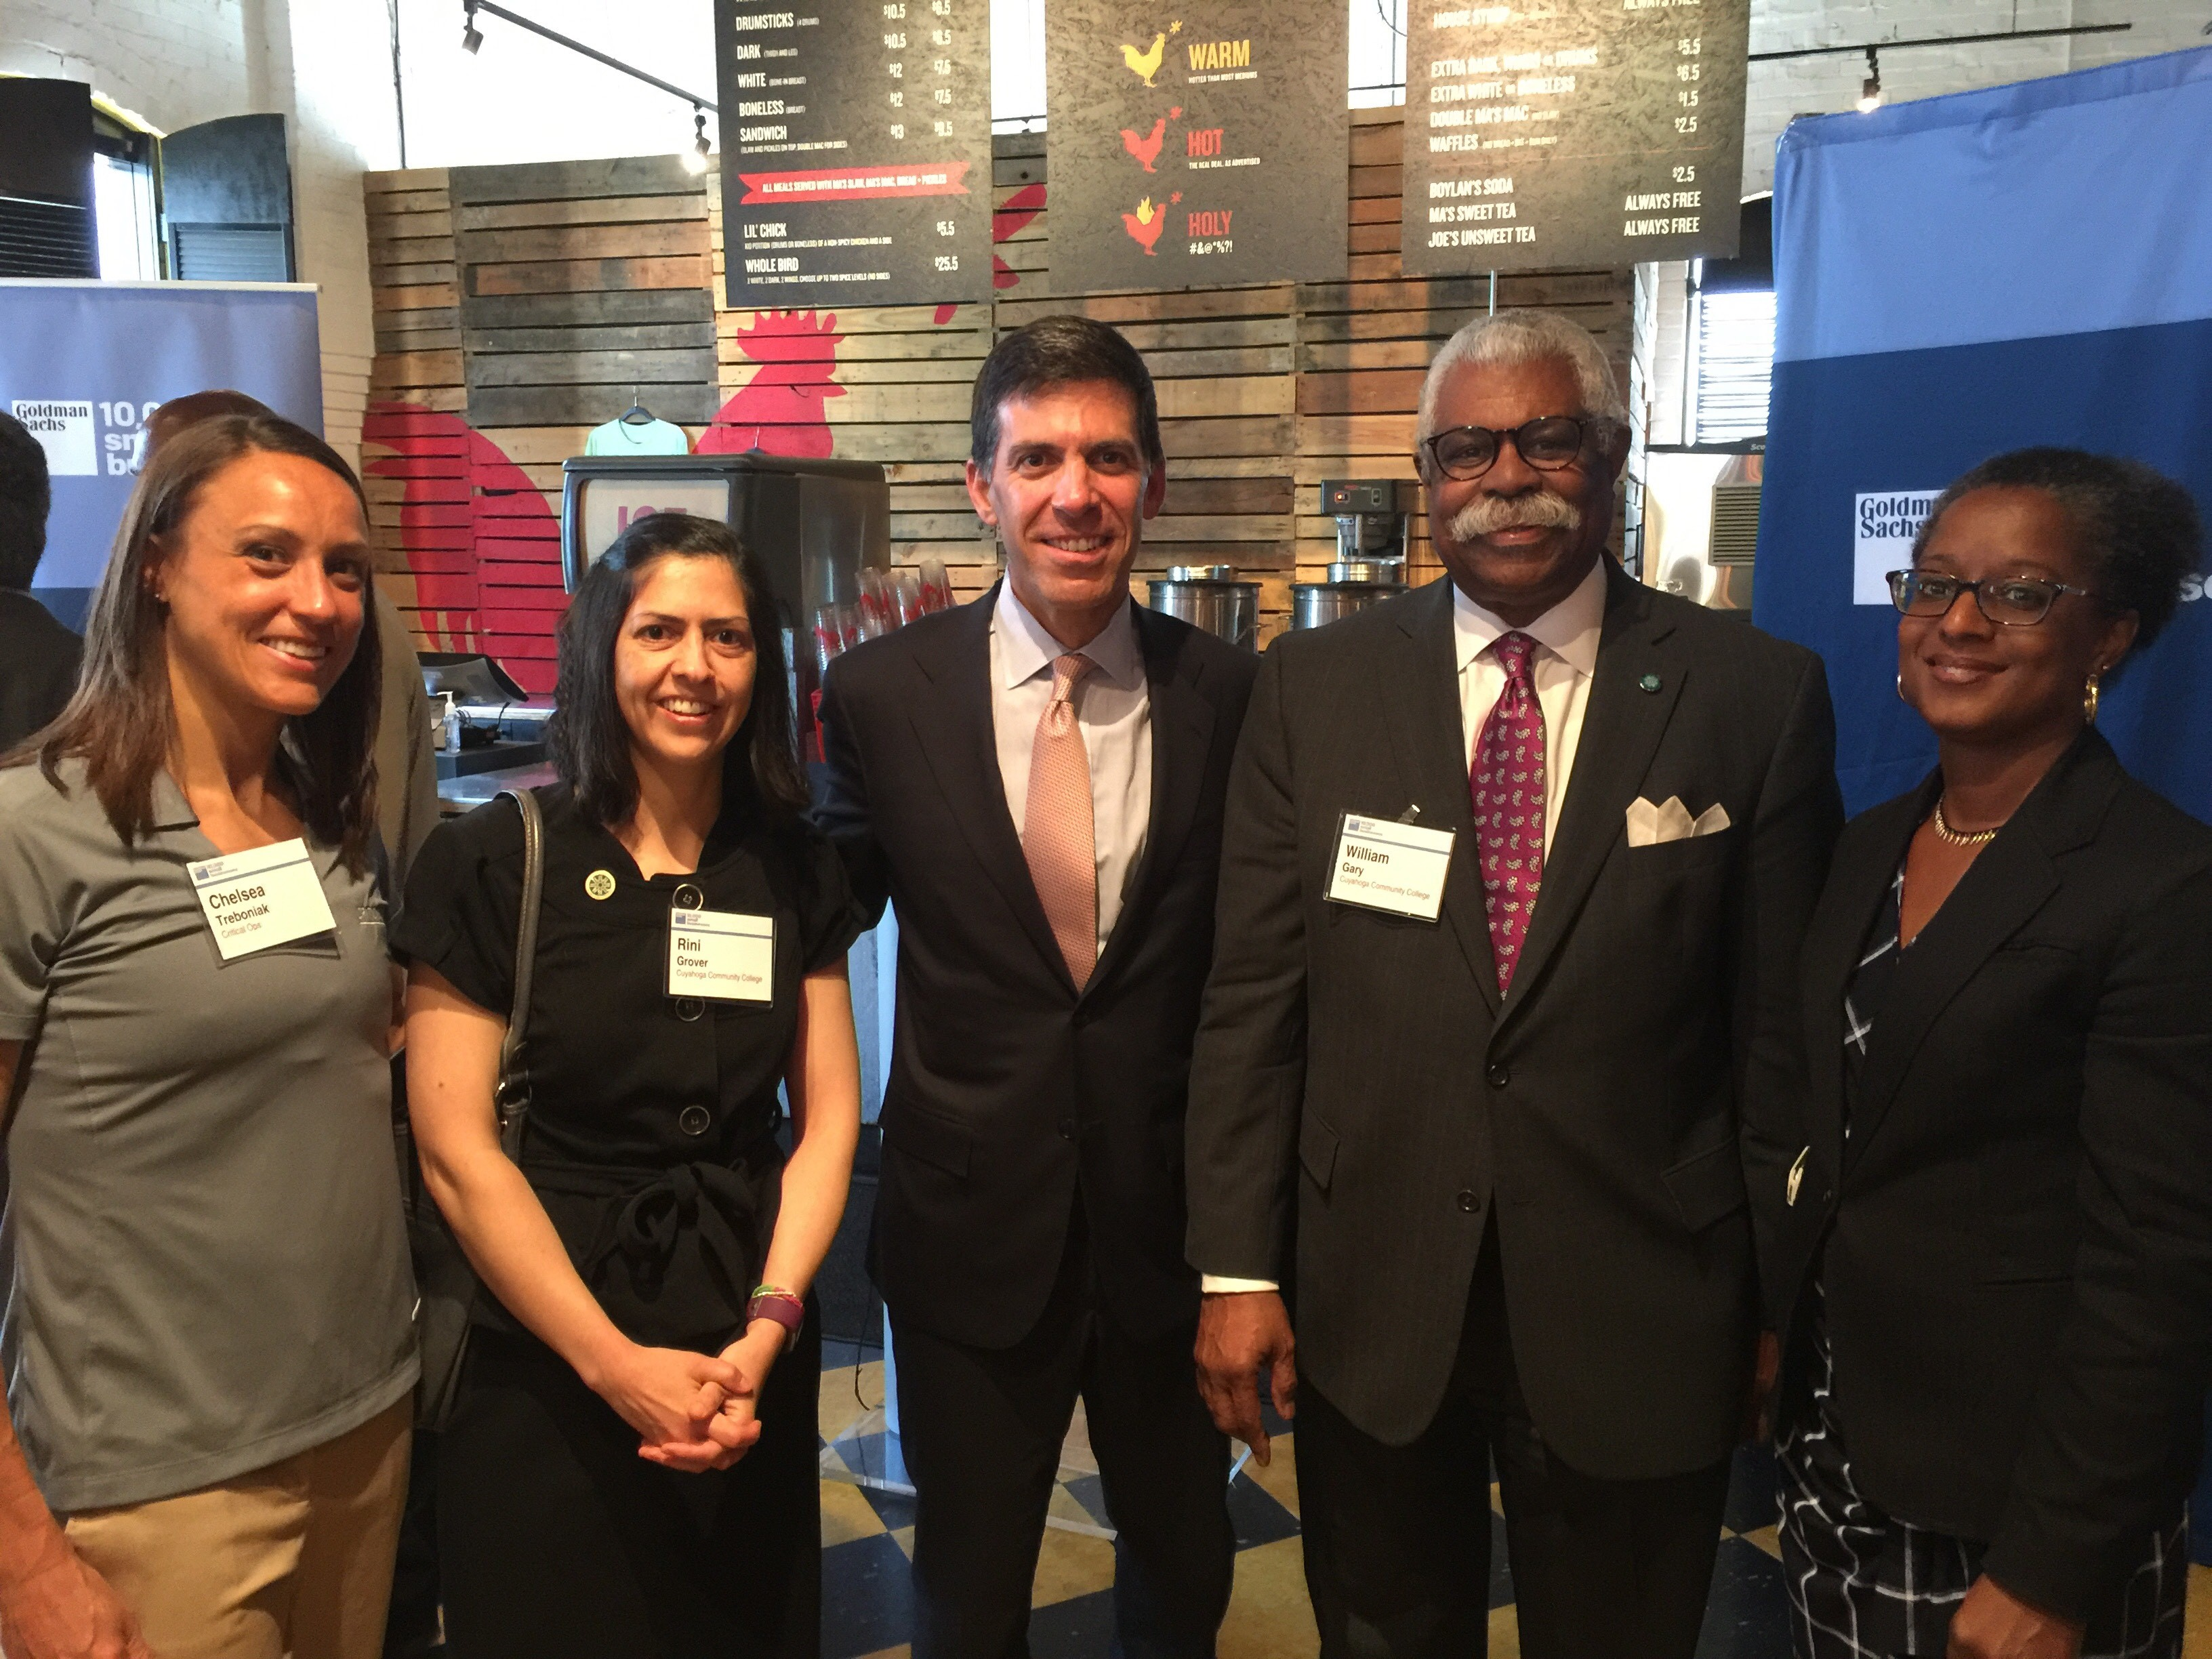 5 participants of the Goldman Sachs 10KSB launch in Columbus, Ohio